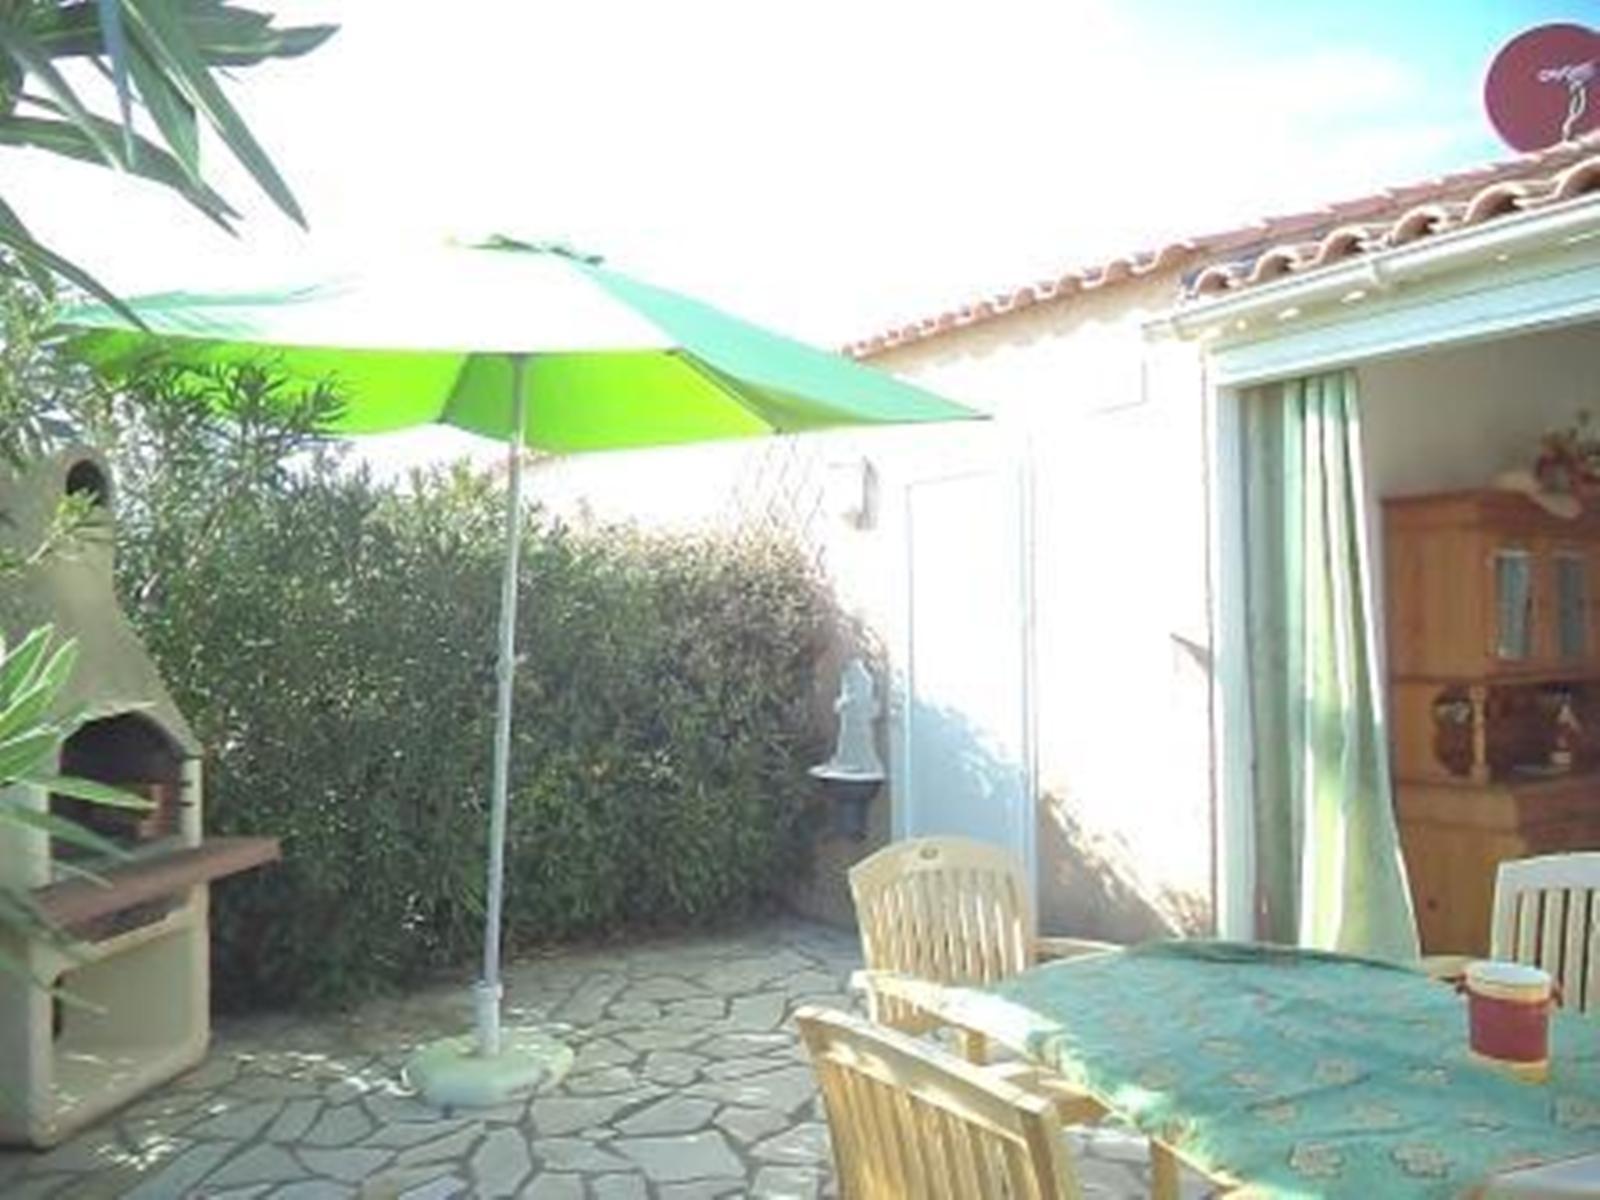 Location ile bleue location vacances gruissan for Piscine ile bleu seynod